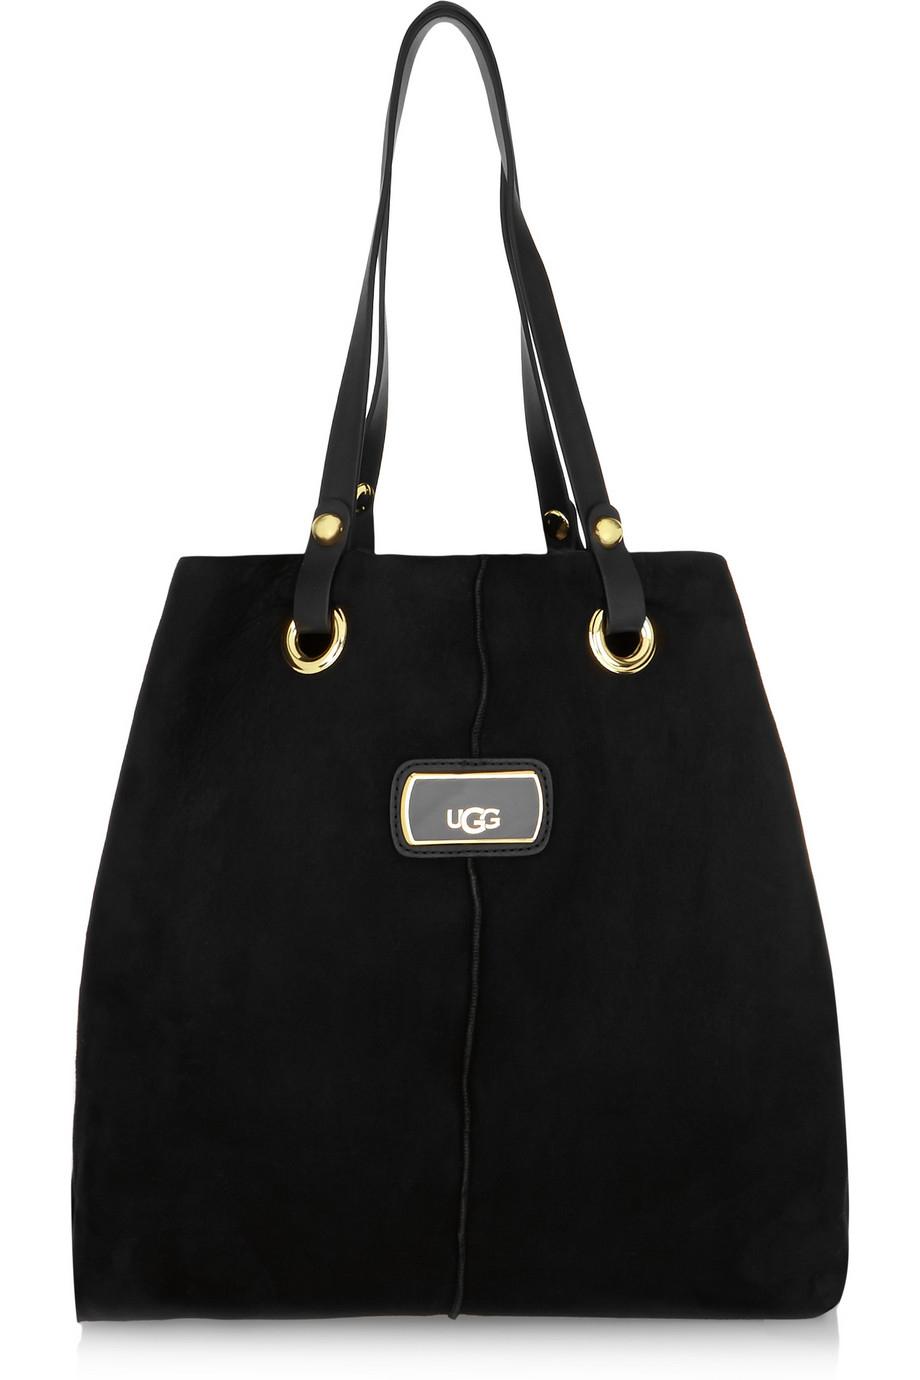 black ugg purse